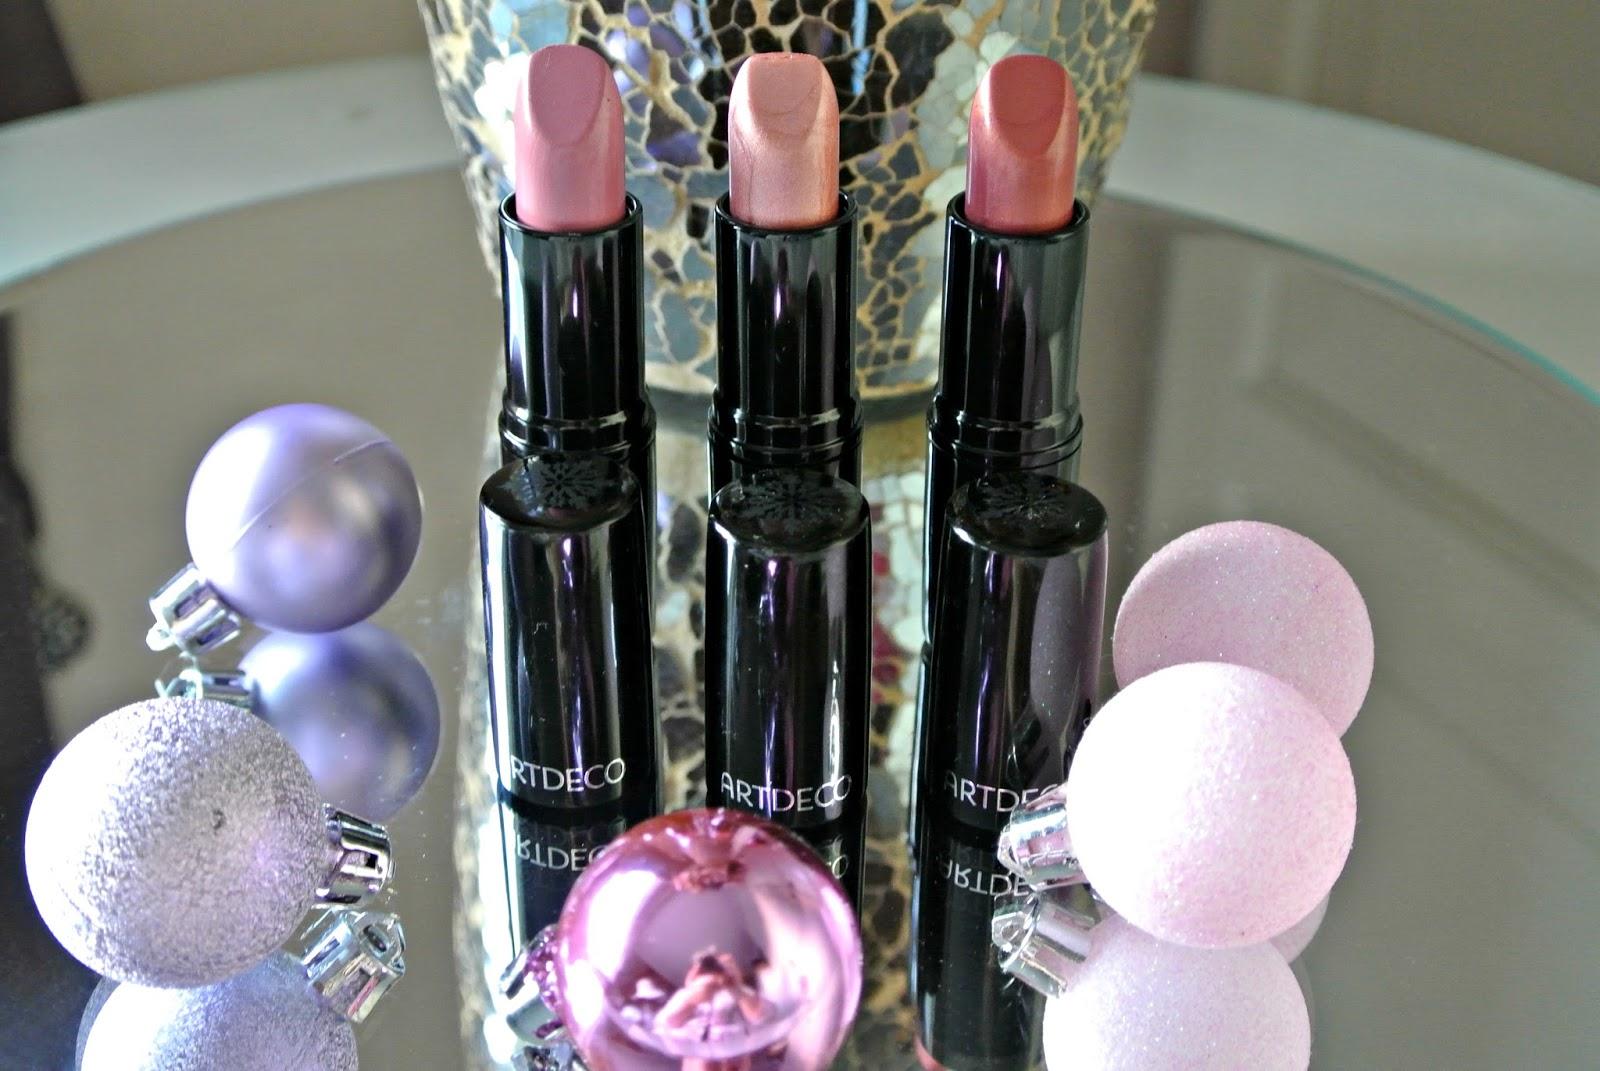 Artdeco Arctic Beauty Perfect Colour Lipstick